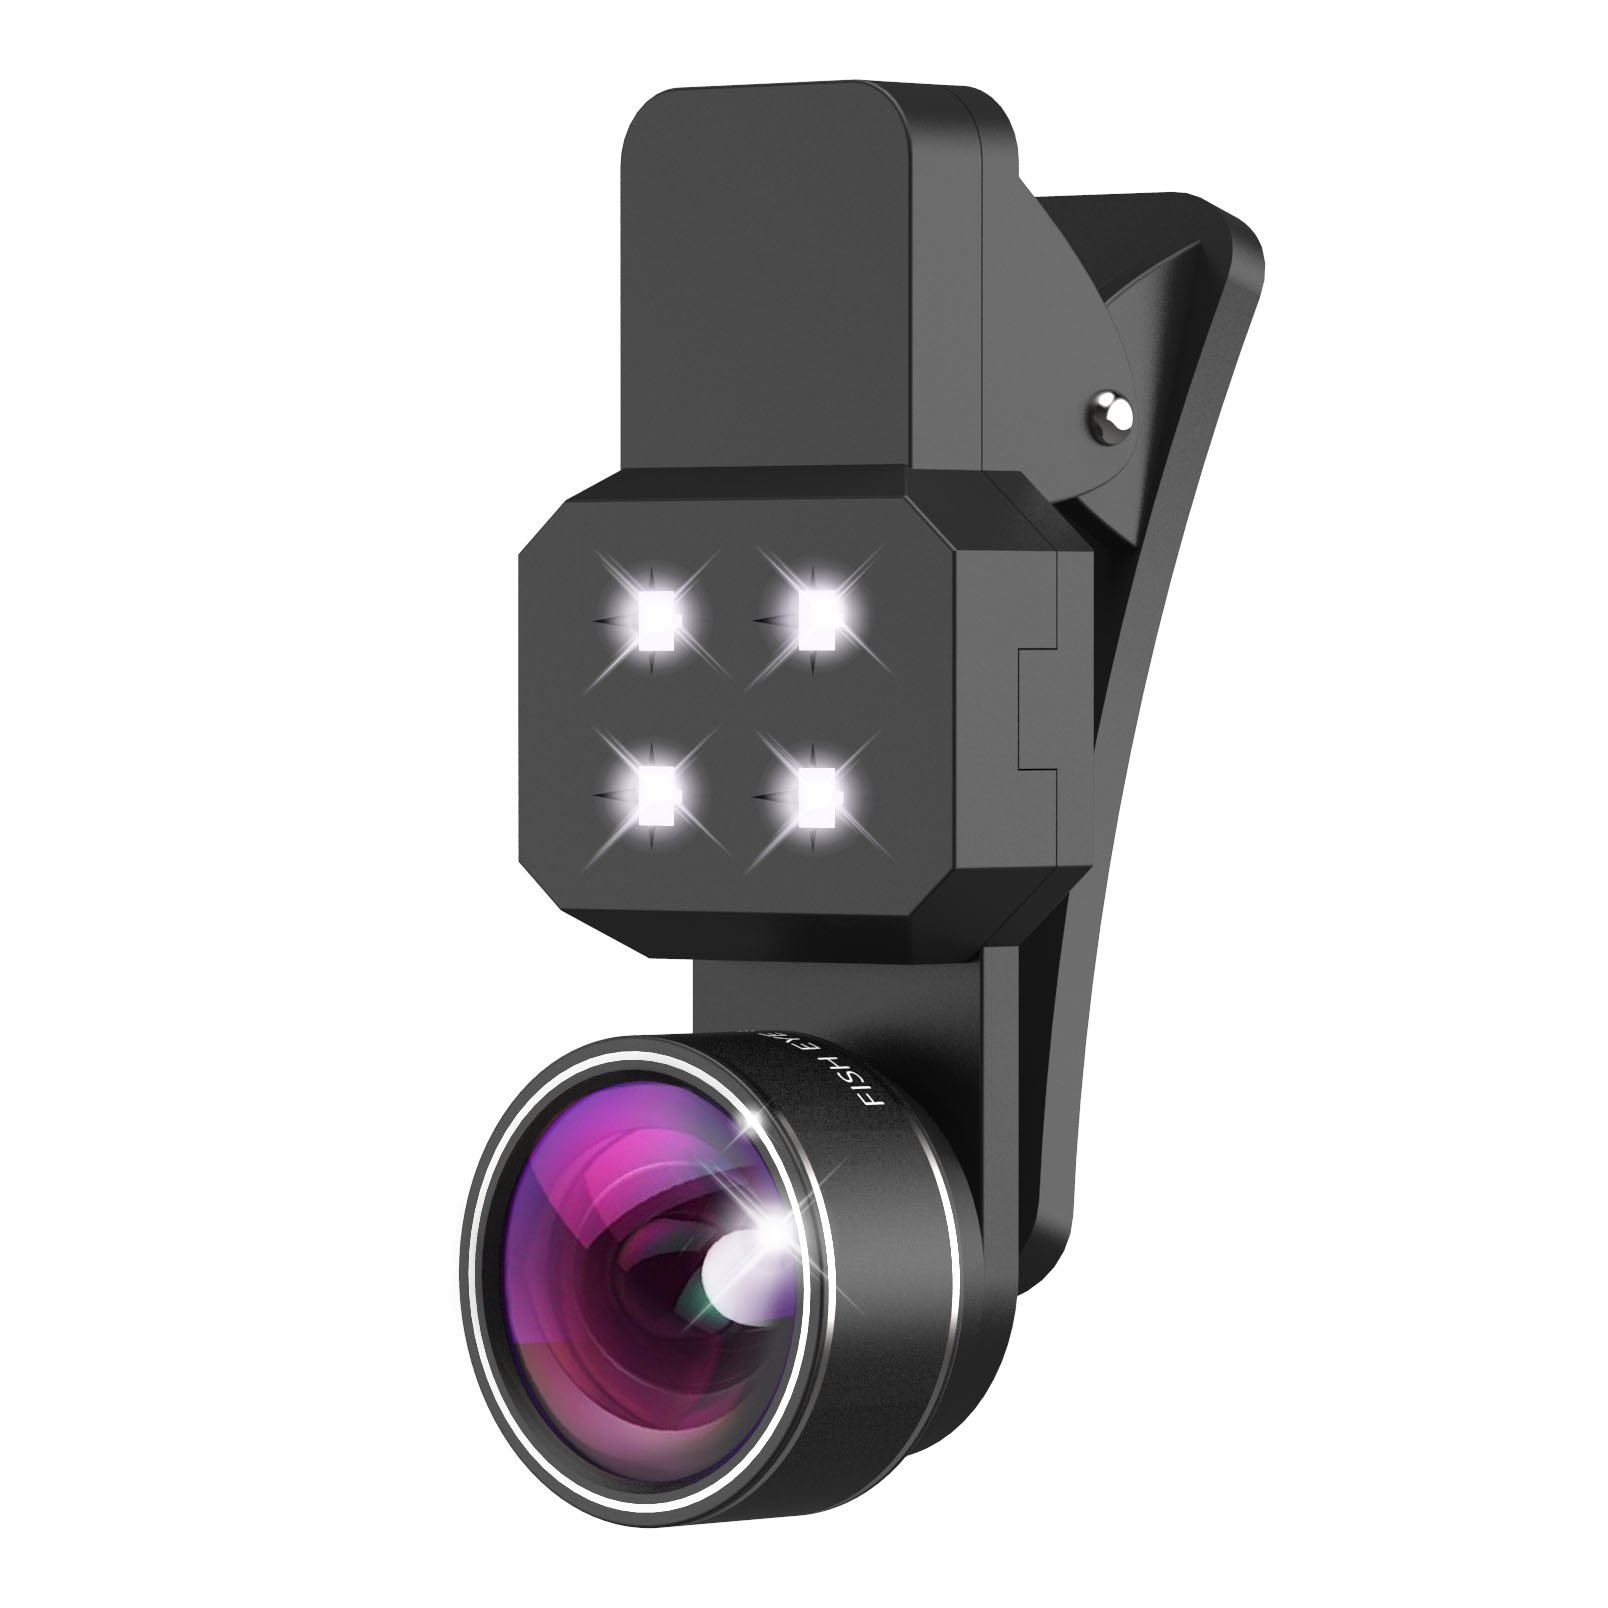 Kootek 4 In 1 198 Fisheye Lens With Beauty Led Fill Light 15X Micro Lens Plus.. 14